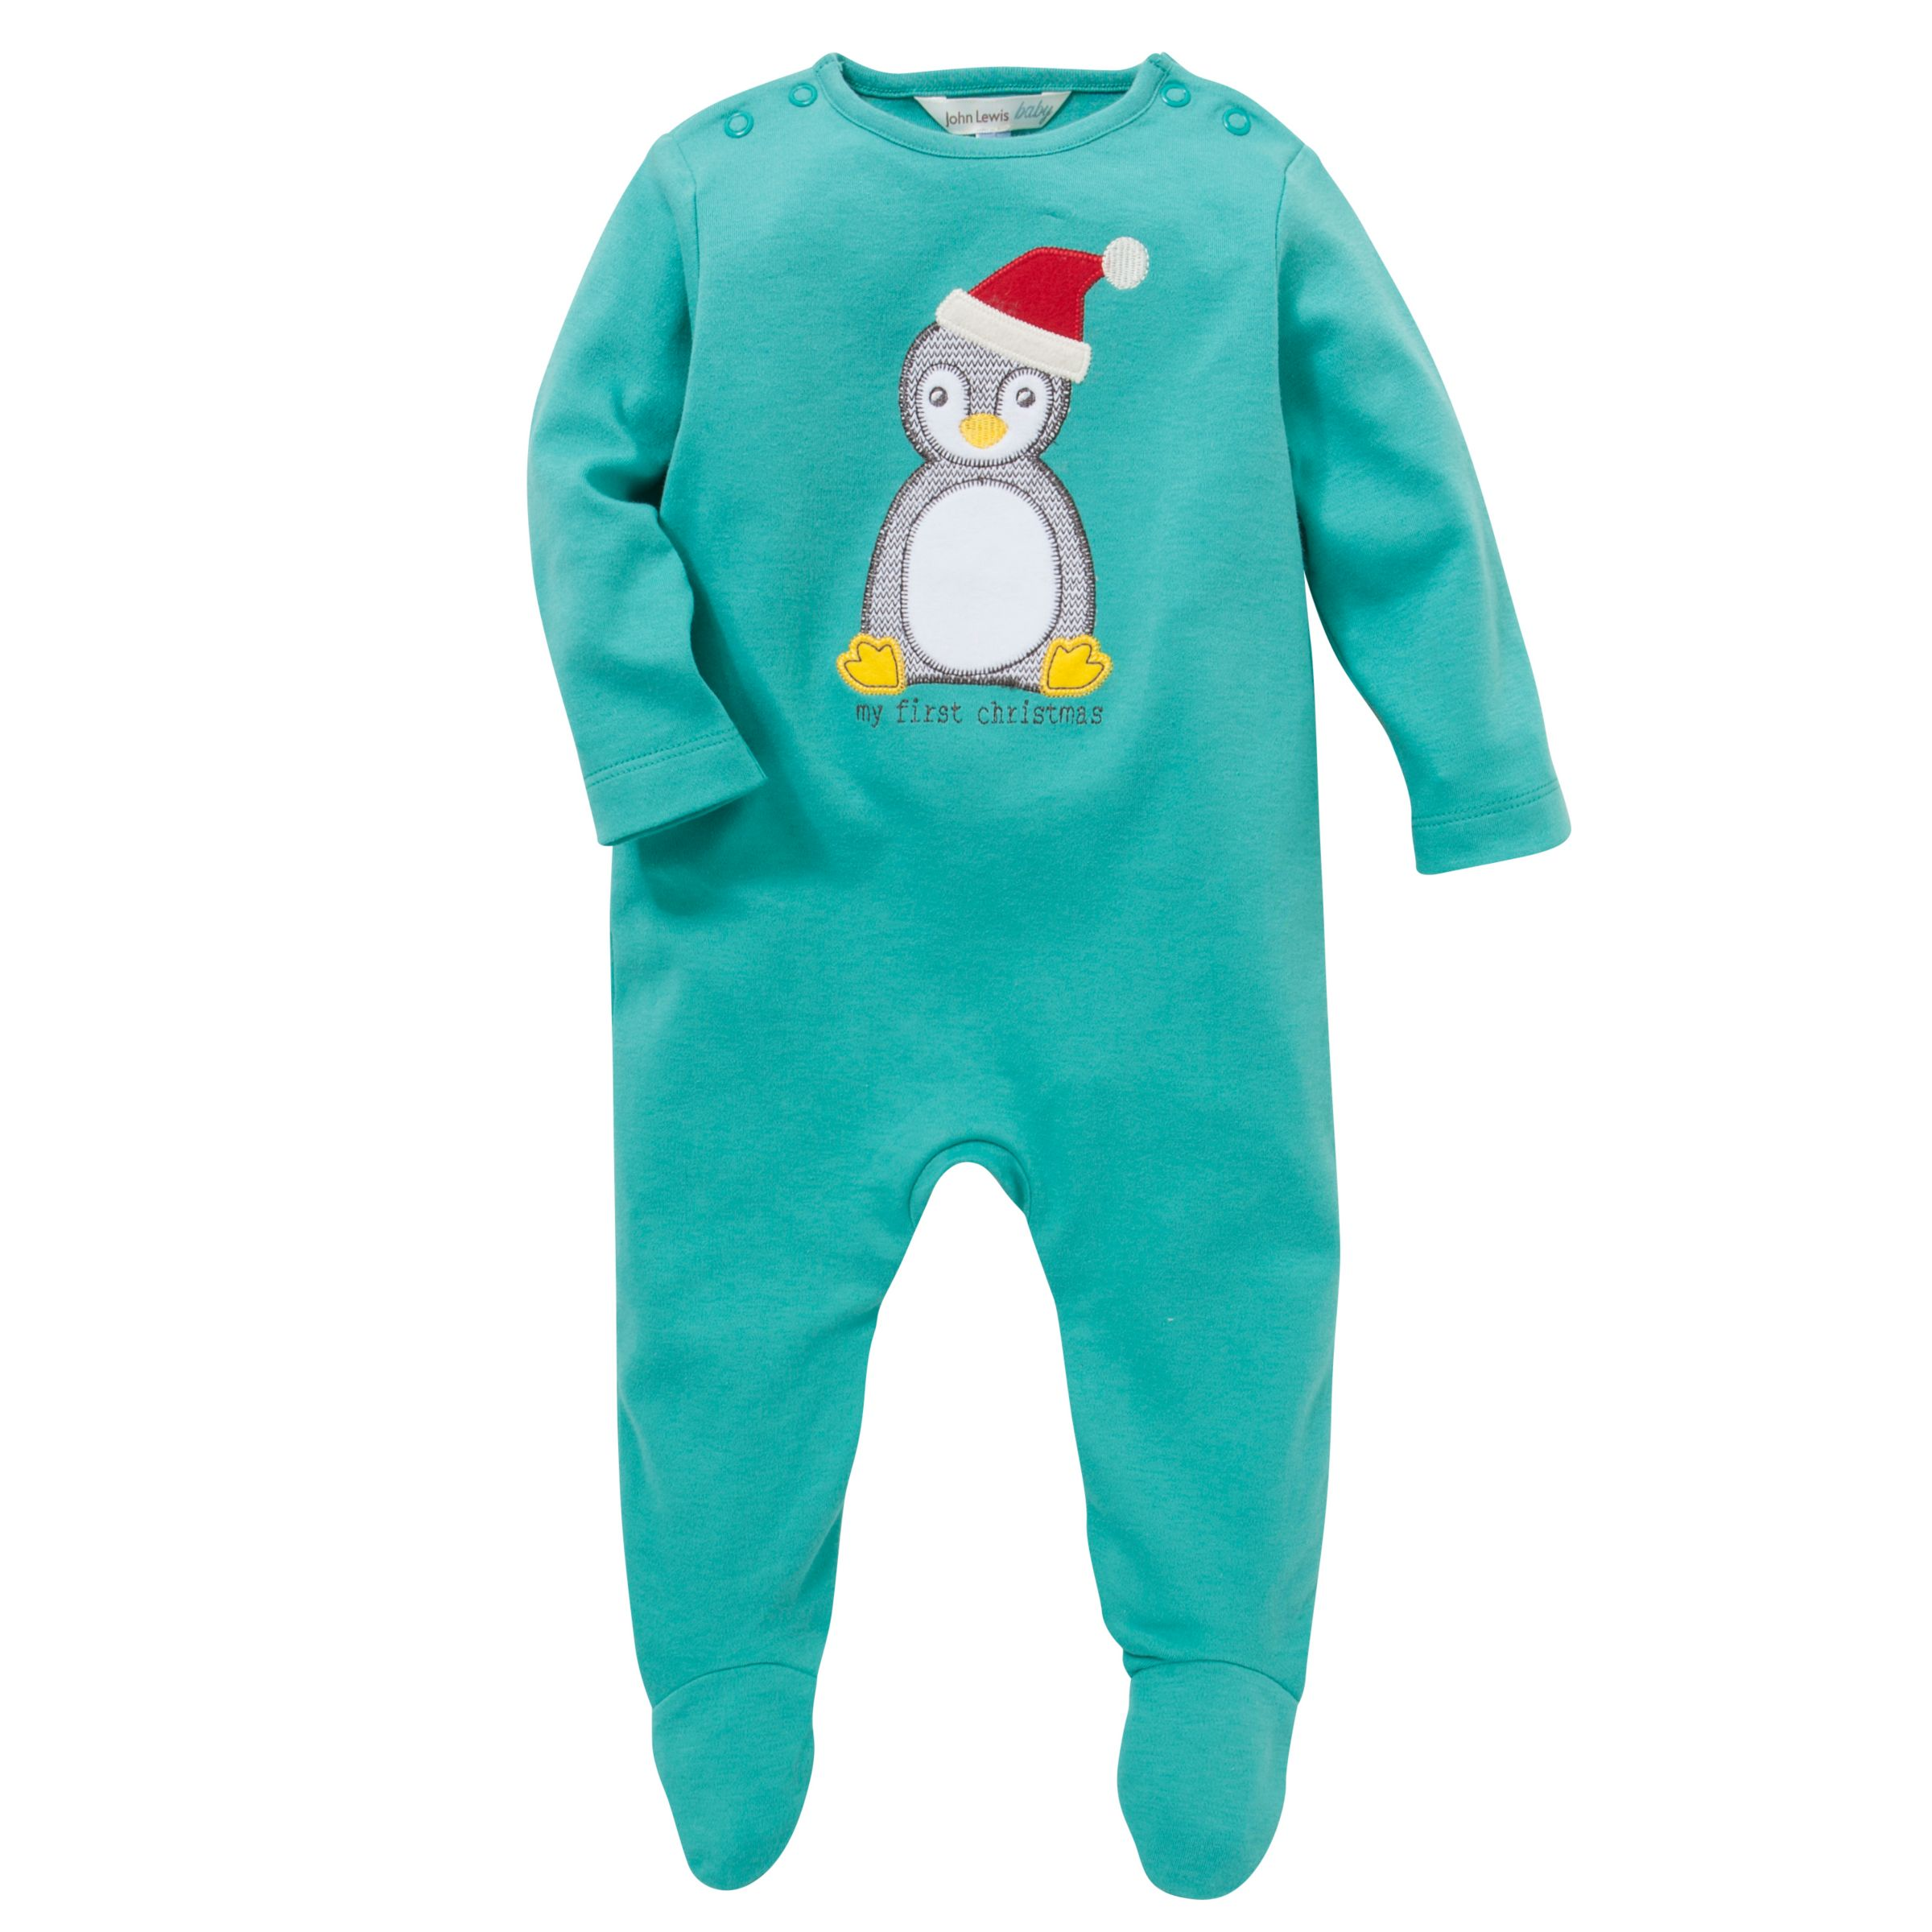 91c482bcb John Lewis My First Christmas Sleepsuit